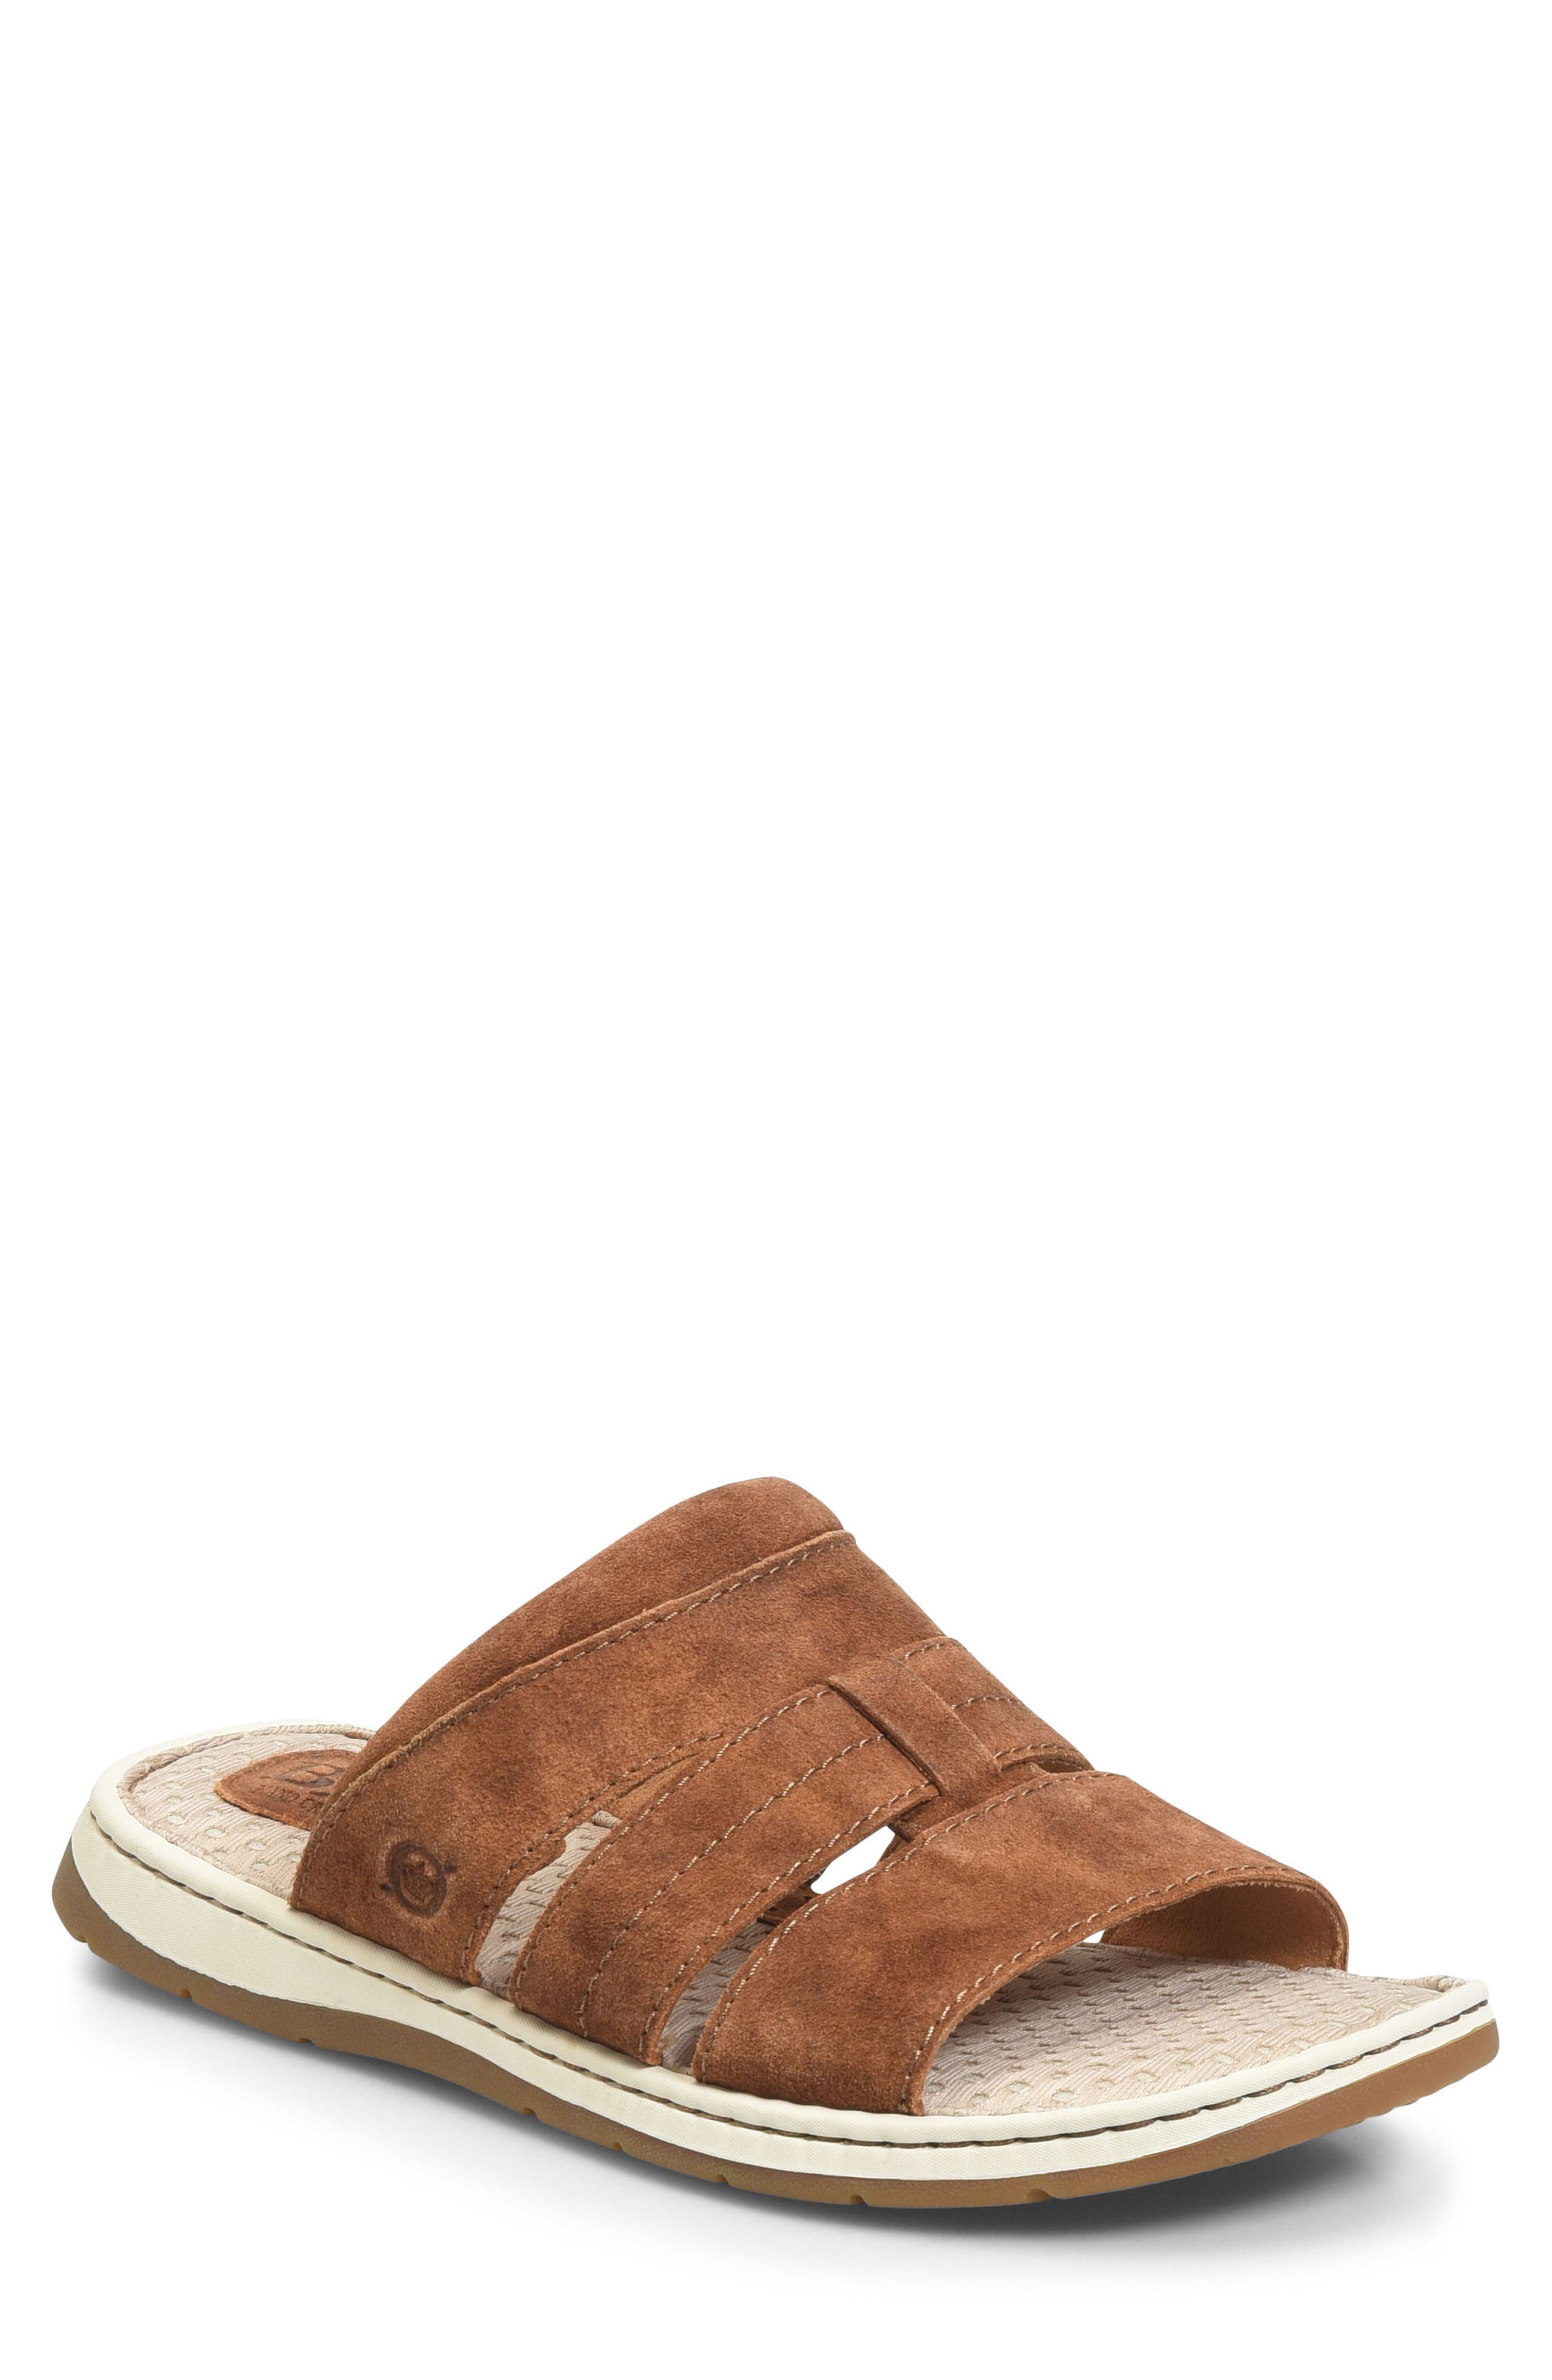 Sail Slide Sandal,                             Main thumbnail 1, color,                             Rust Leather